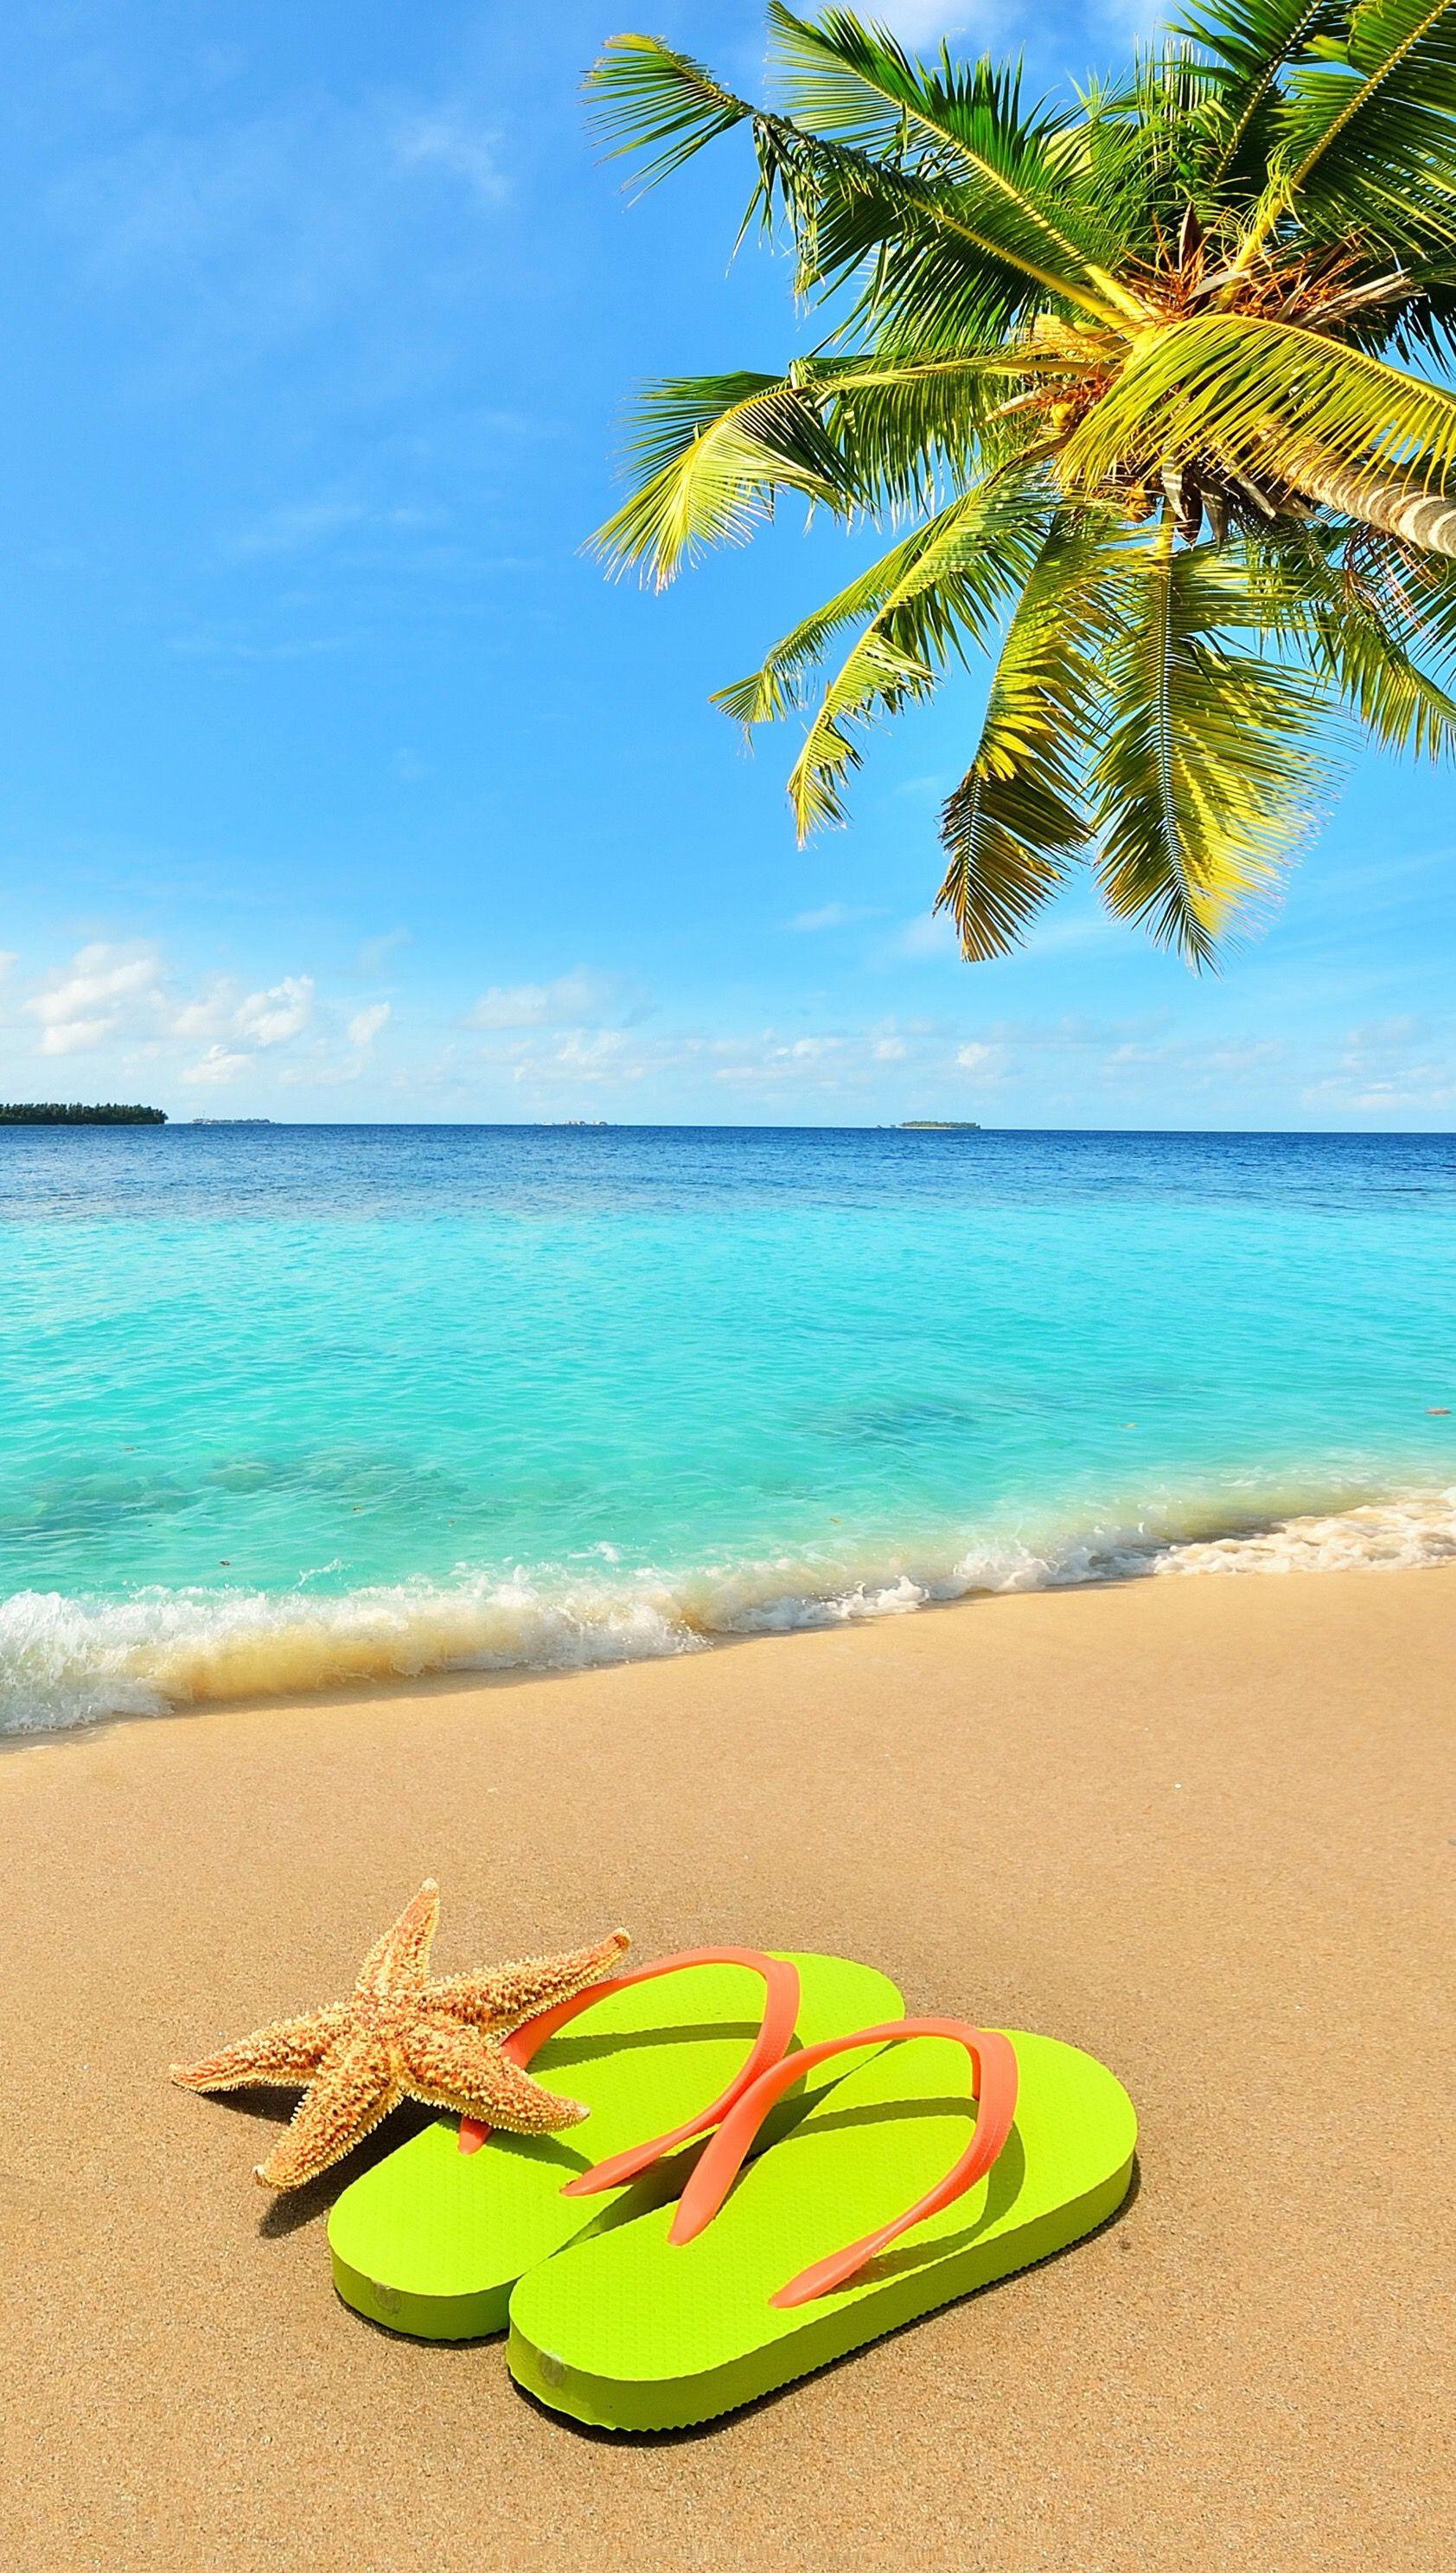 Apple Iphone X Wallpapers トロピカルビーチ ハワイ 画像 ビーチの壁紙